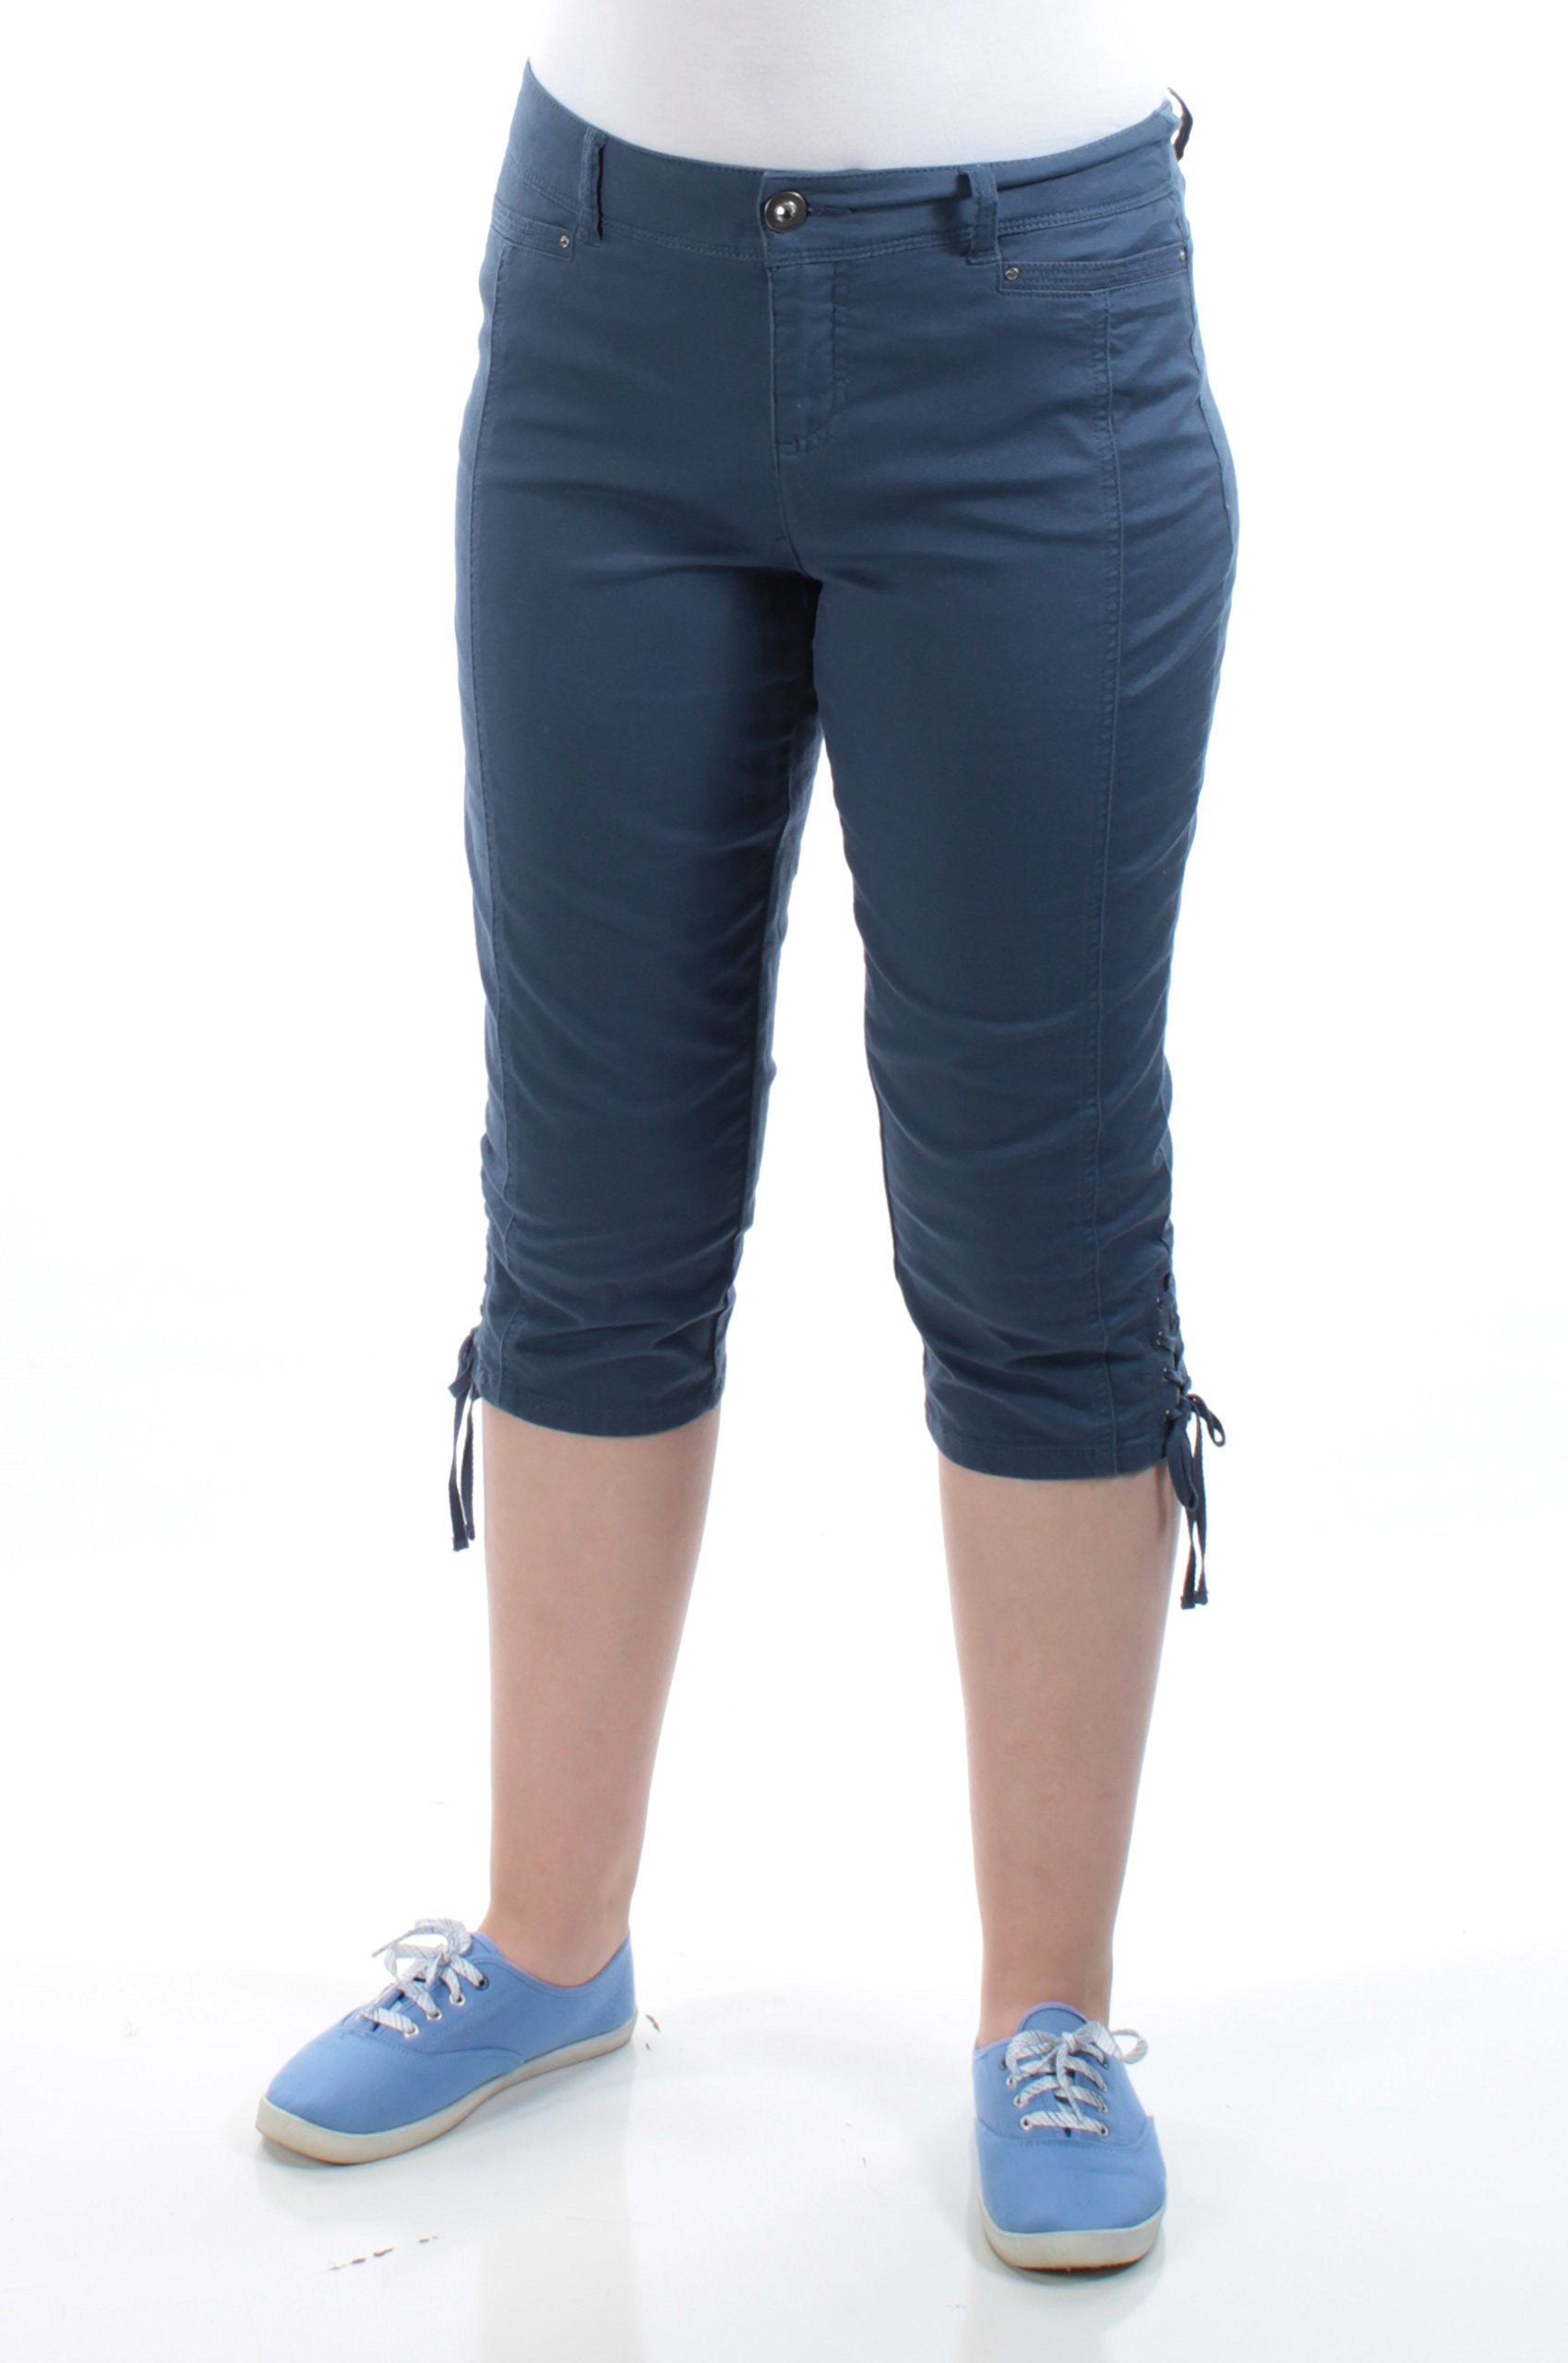 Style & Company Womens New 1086 Blue Tie Capri Casual Pants Petites 8 B+B